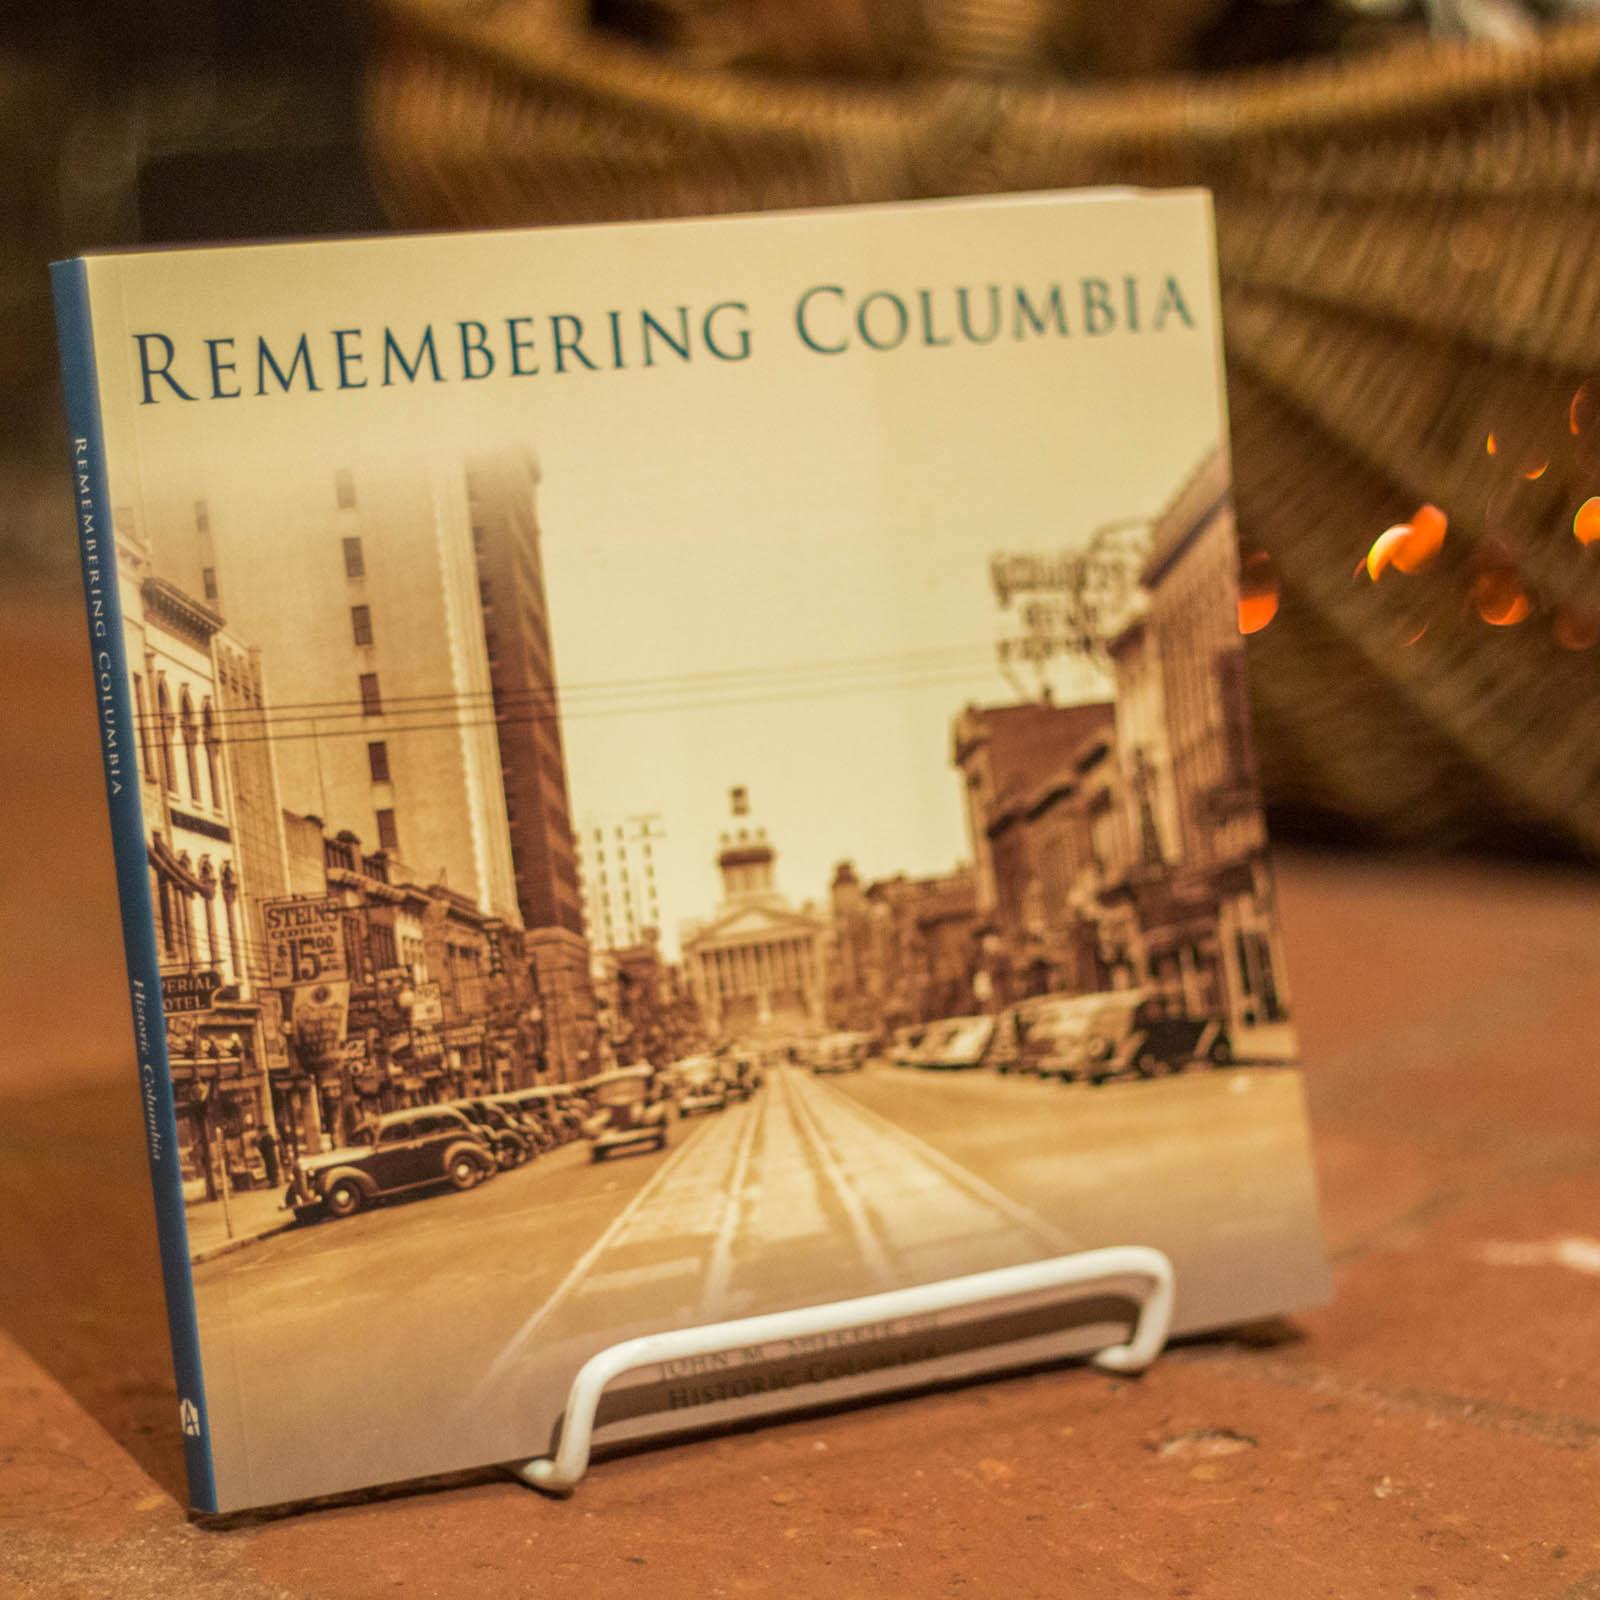 John Sherrer's Remembering Columbia